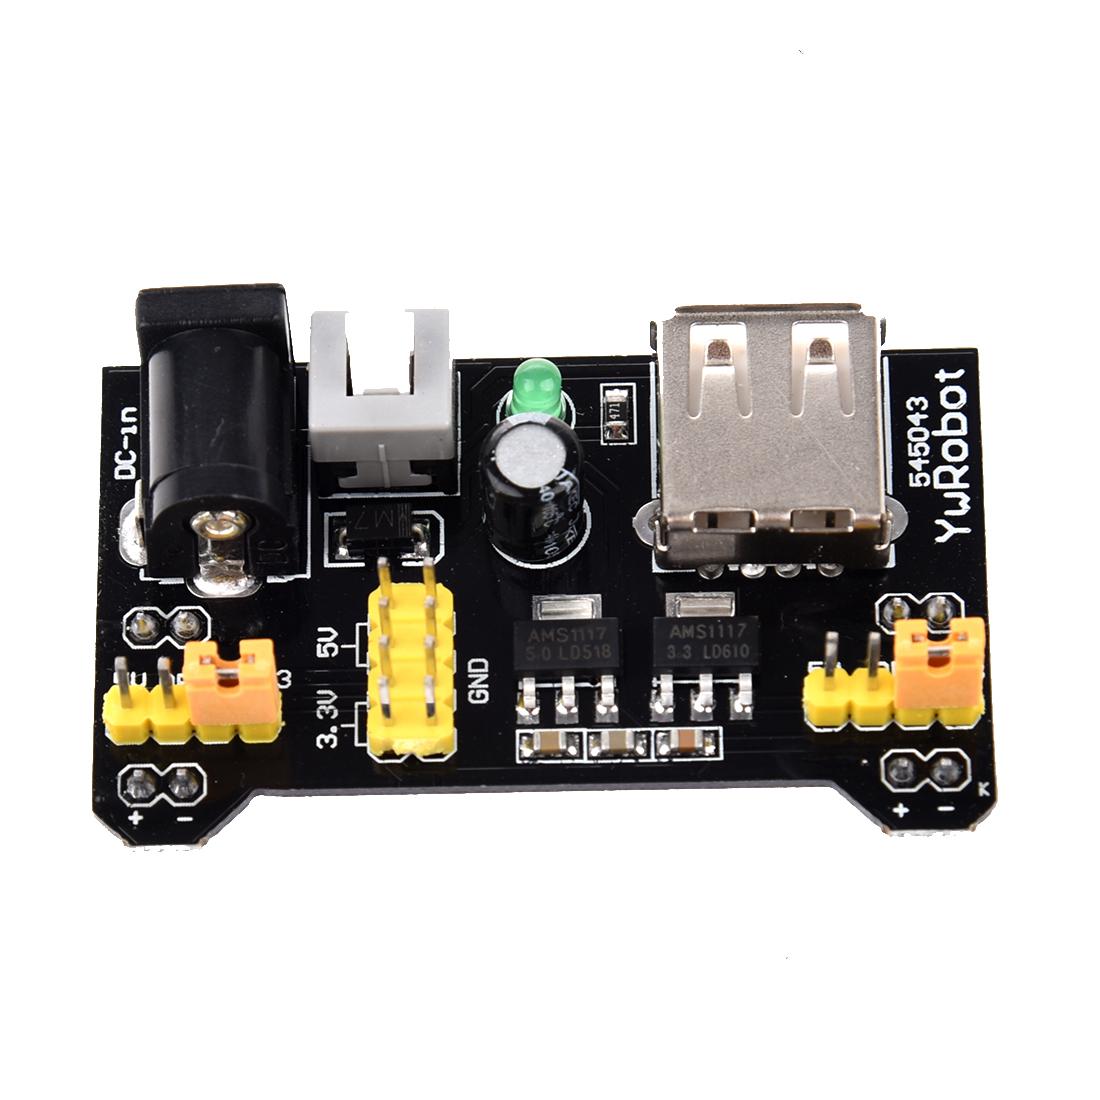 Ranking mb breadboard v power supply module for